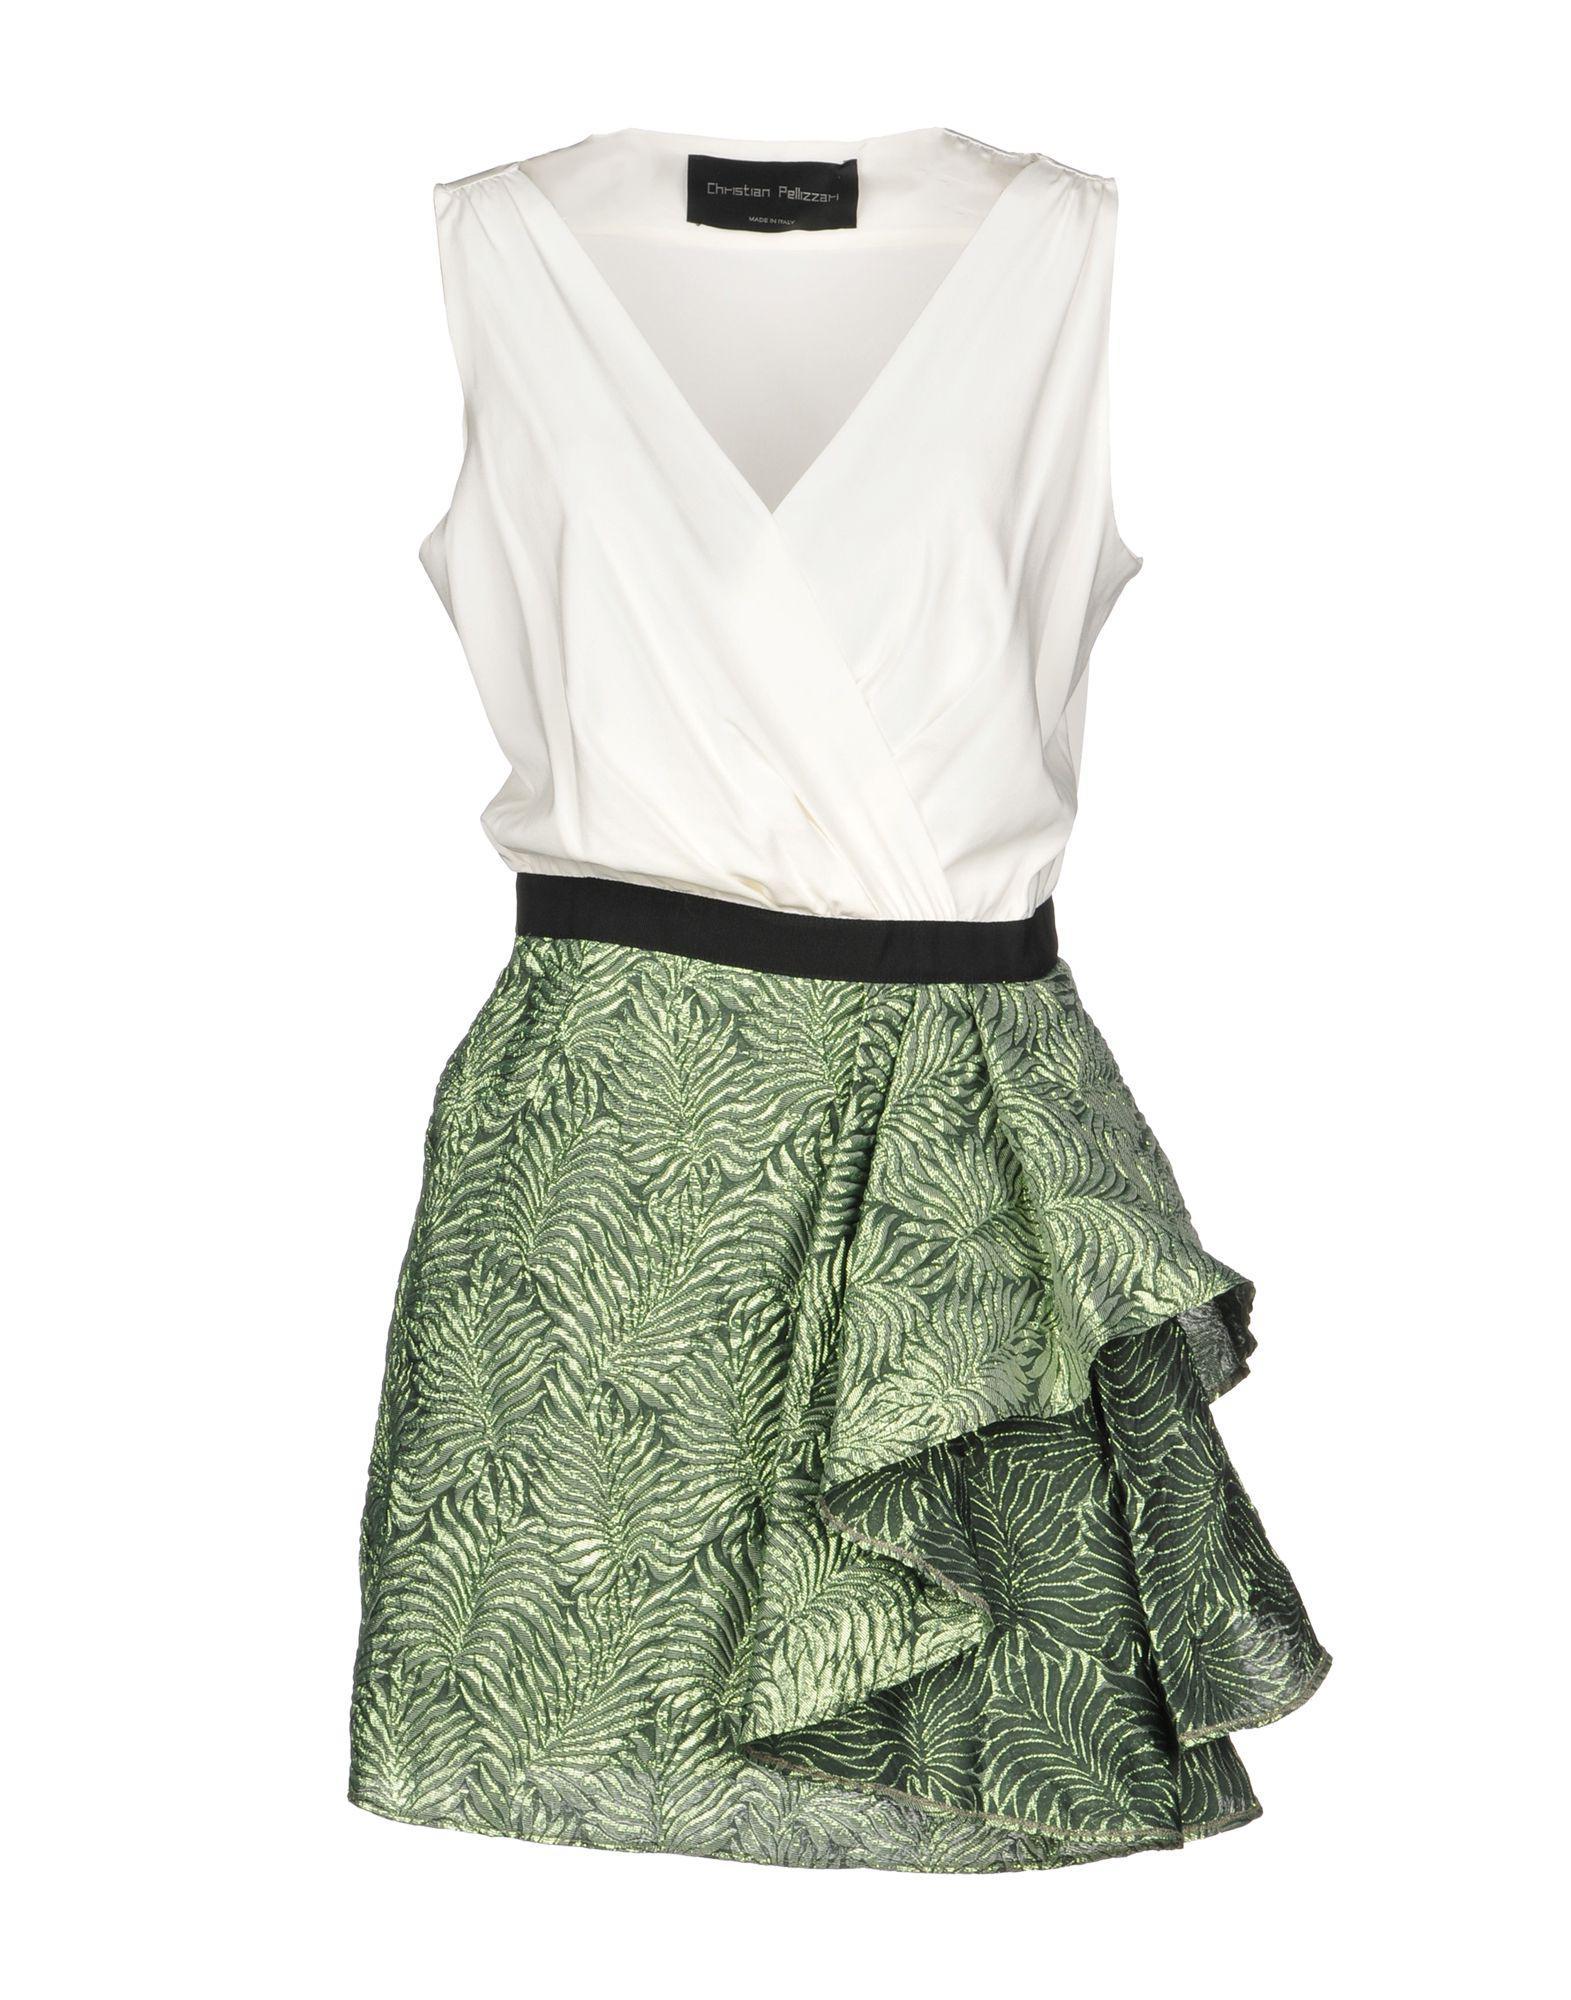 DRESSES - Short dresses Christian Pellizzari 8Uh8ueBpe